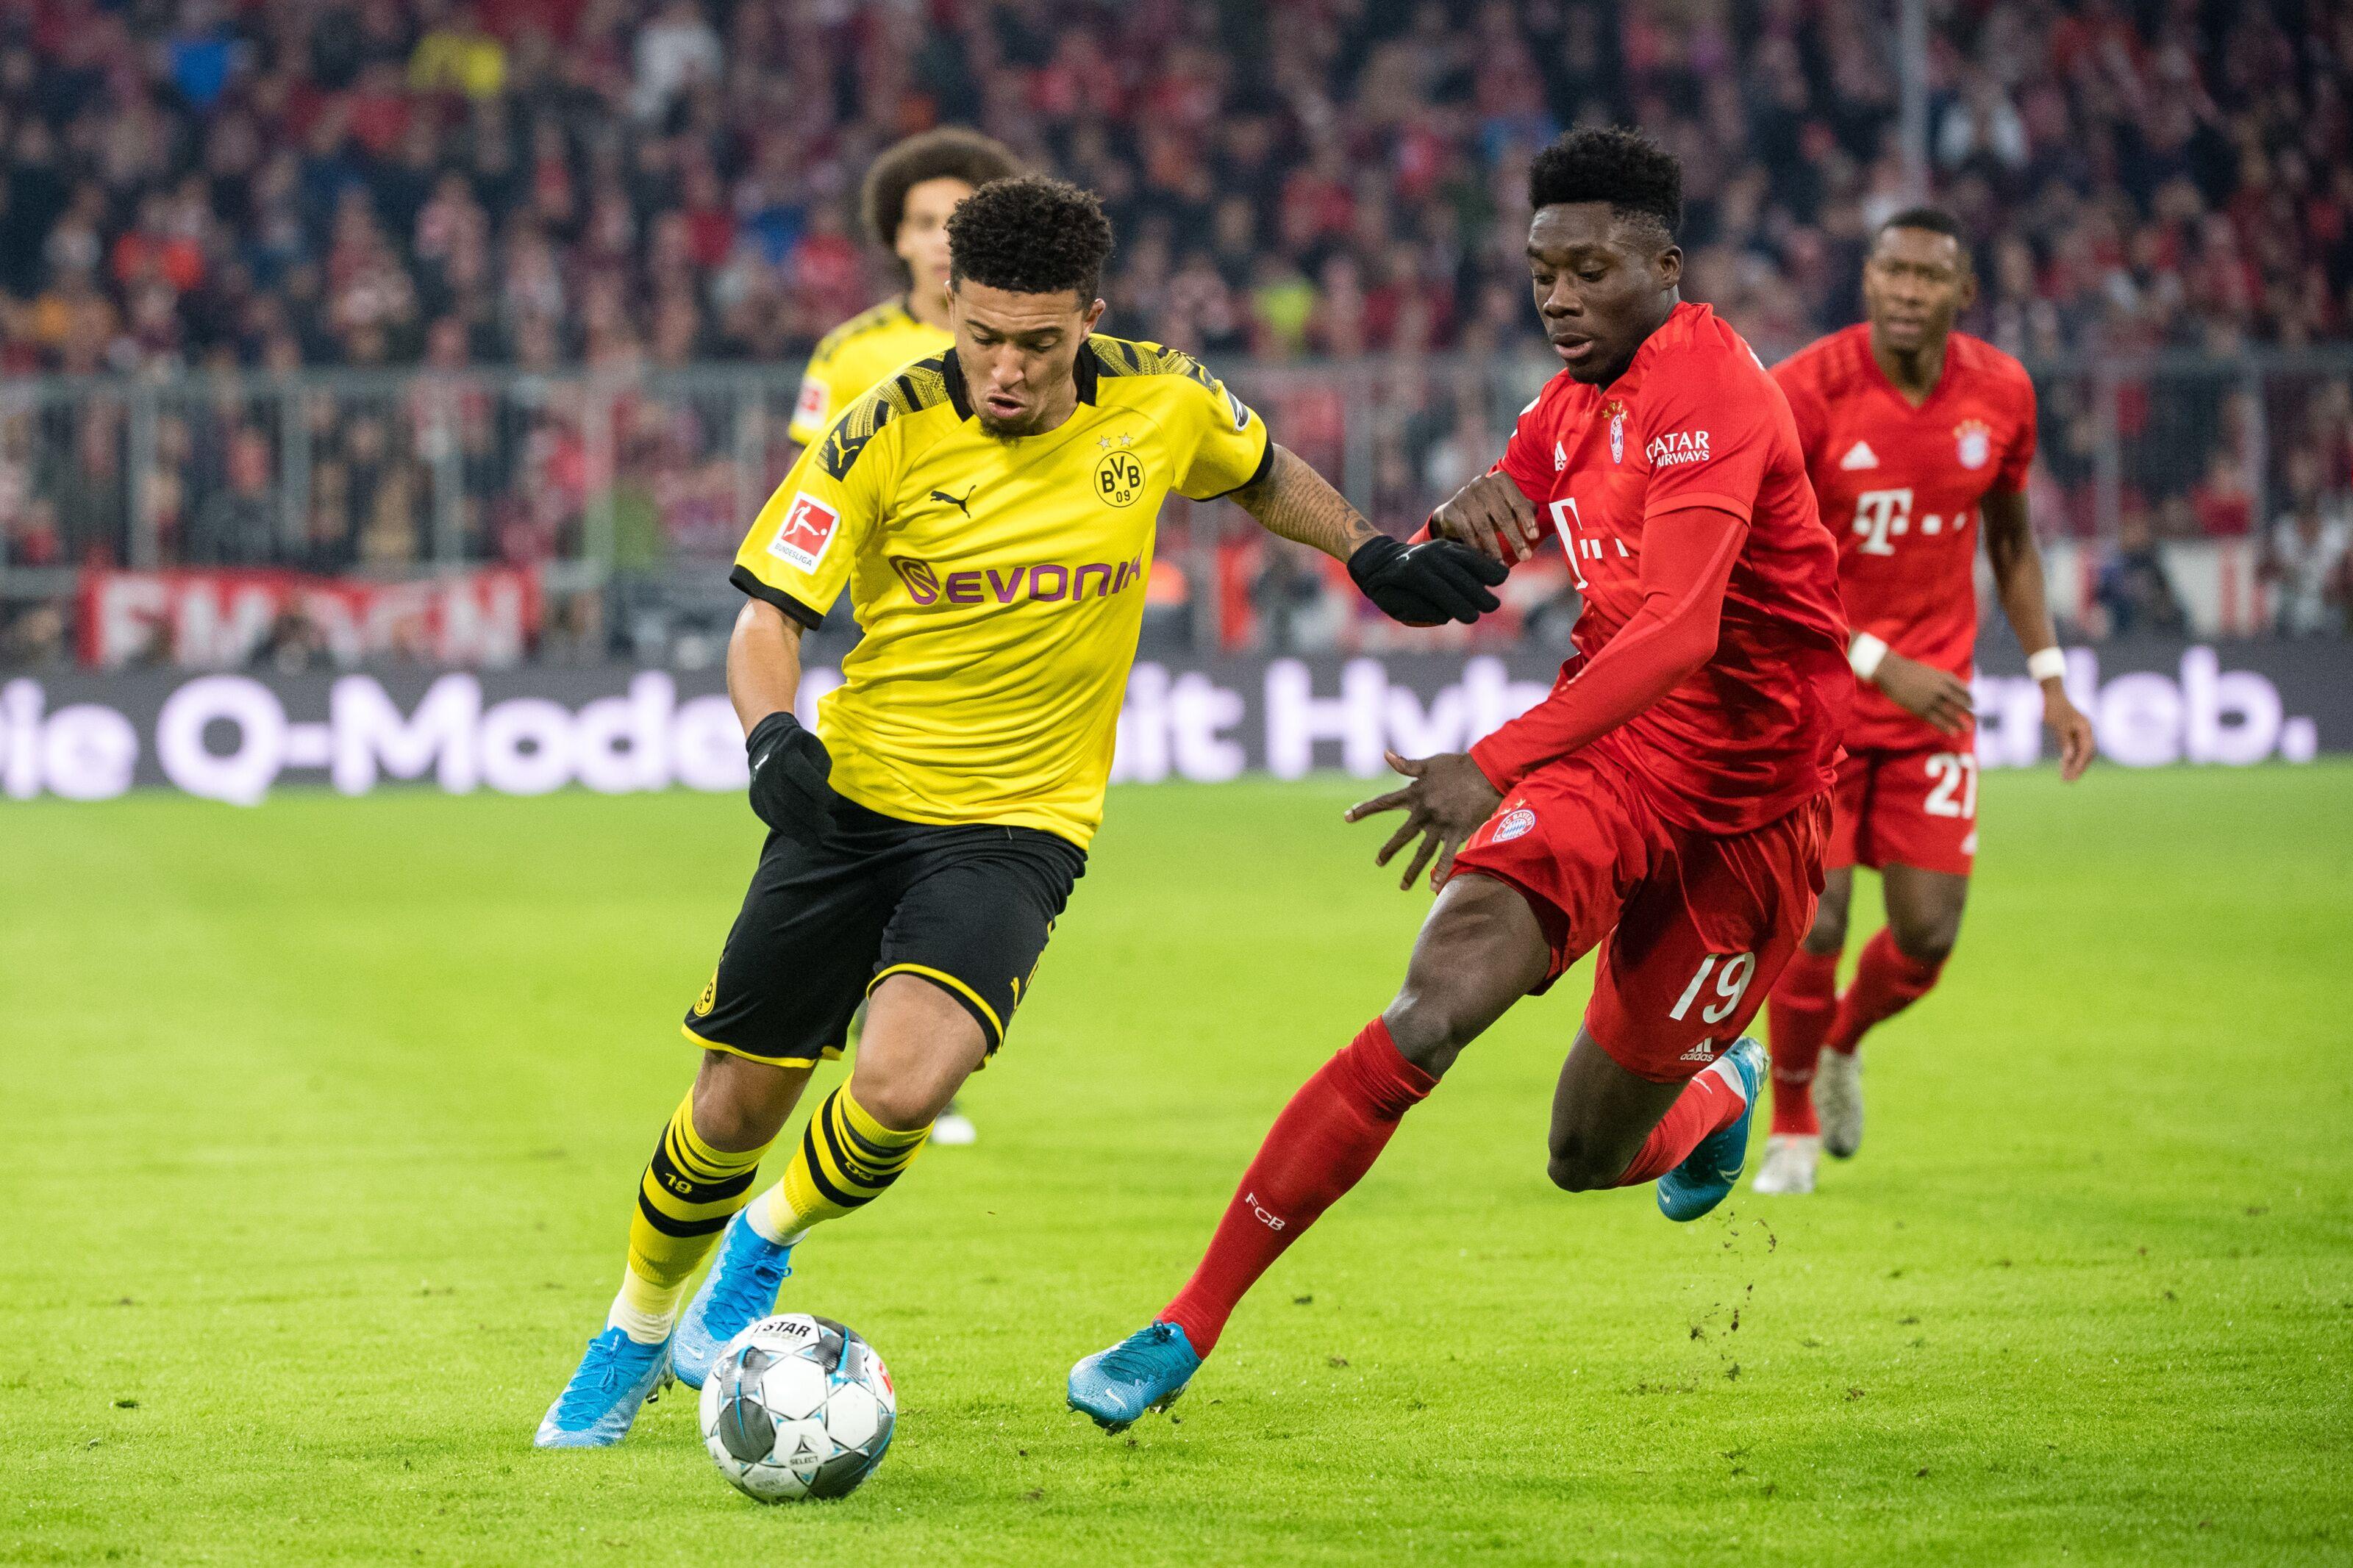 Jadon Sancho could leave Borussia Dortmund next summer